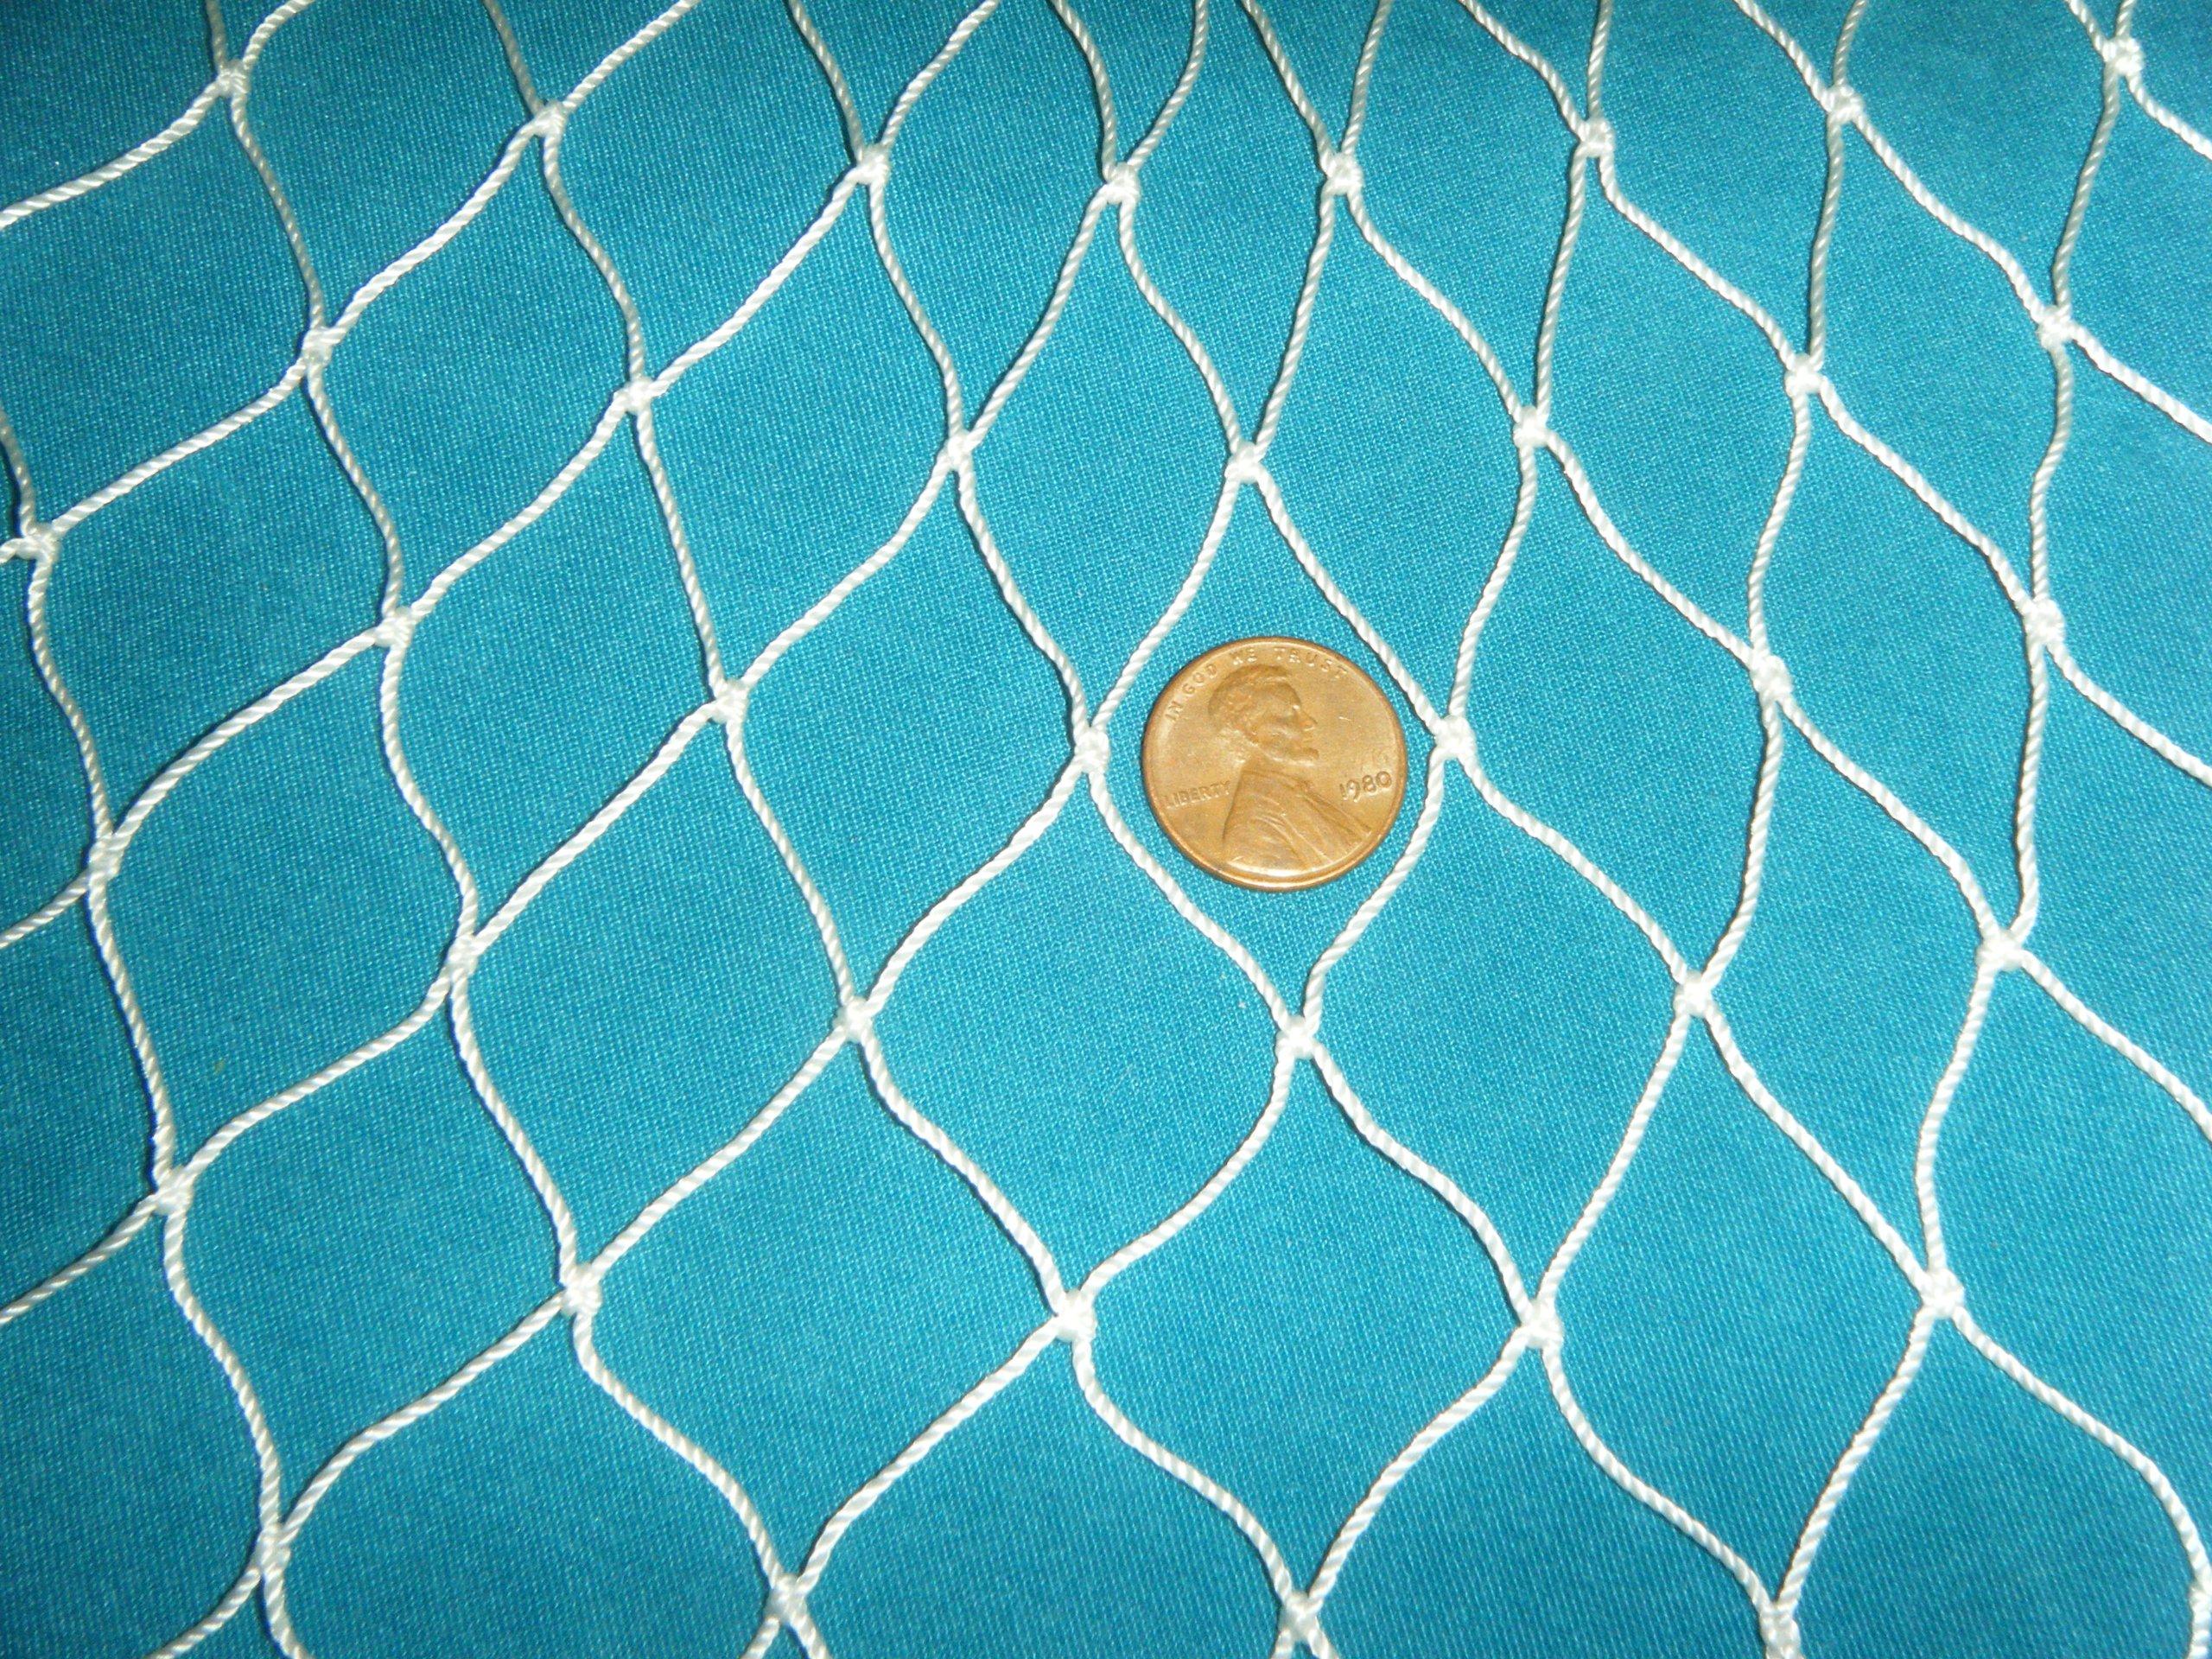 150 X 8 Fishing Net Netting Nautical Display Wedding Decor Garden Pond Birds by Florida Nets